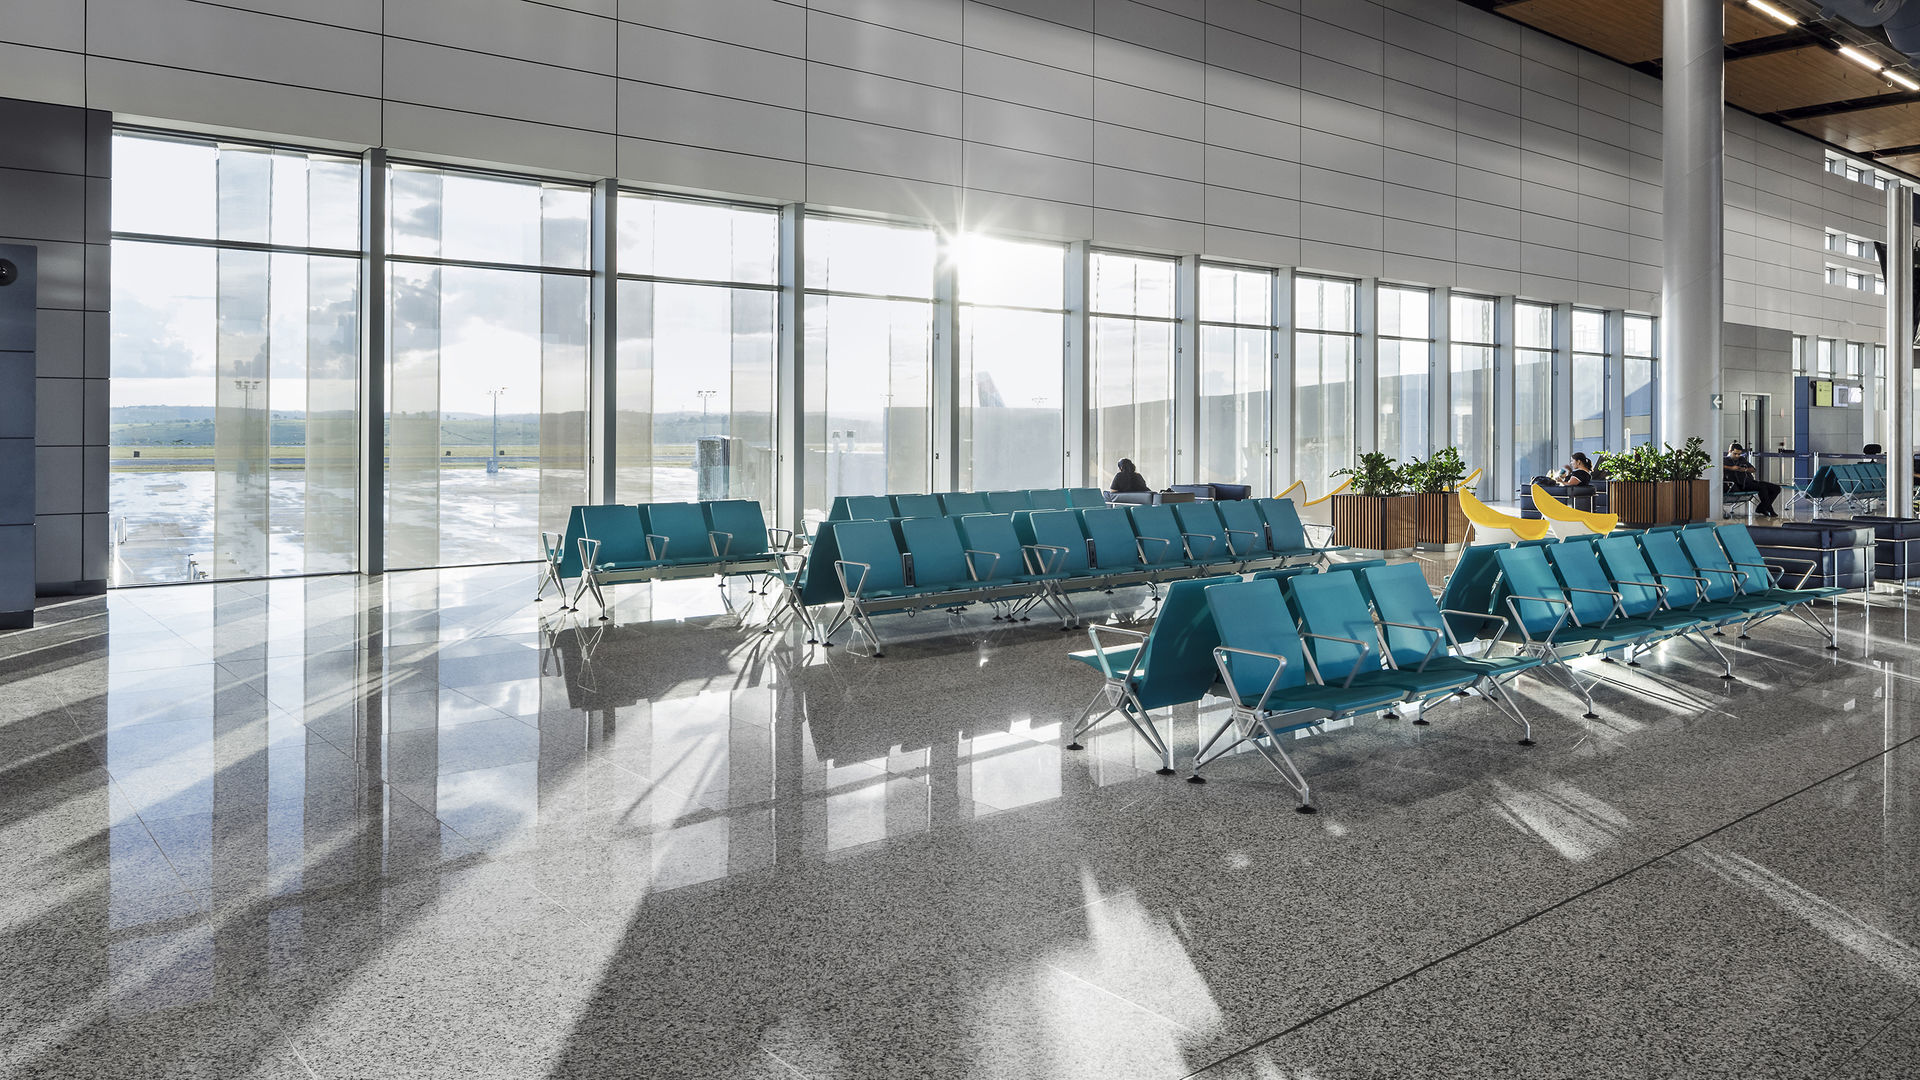 Airport Belo Horizonte_web_16-9